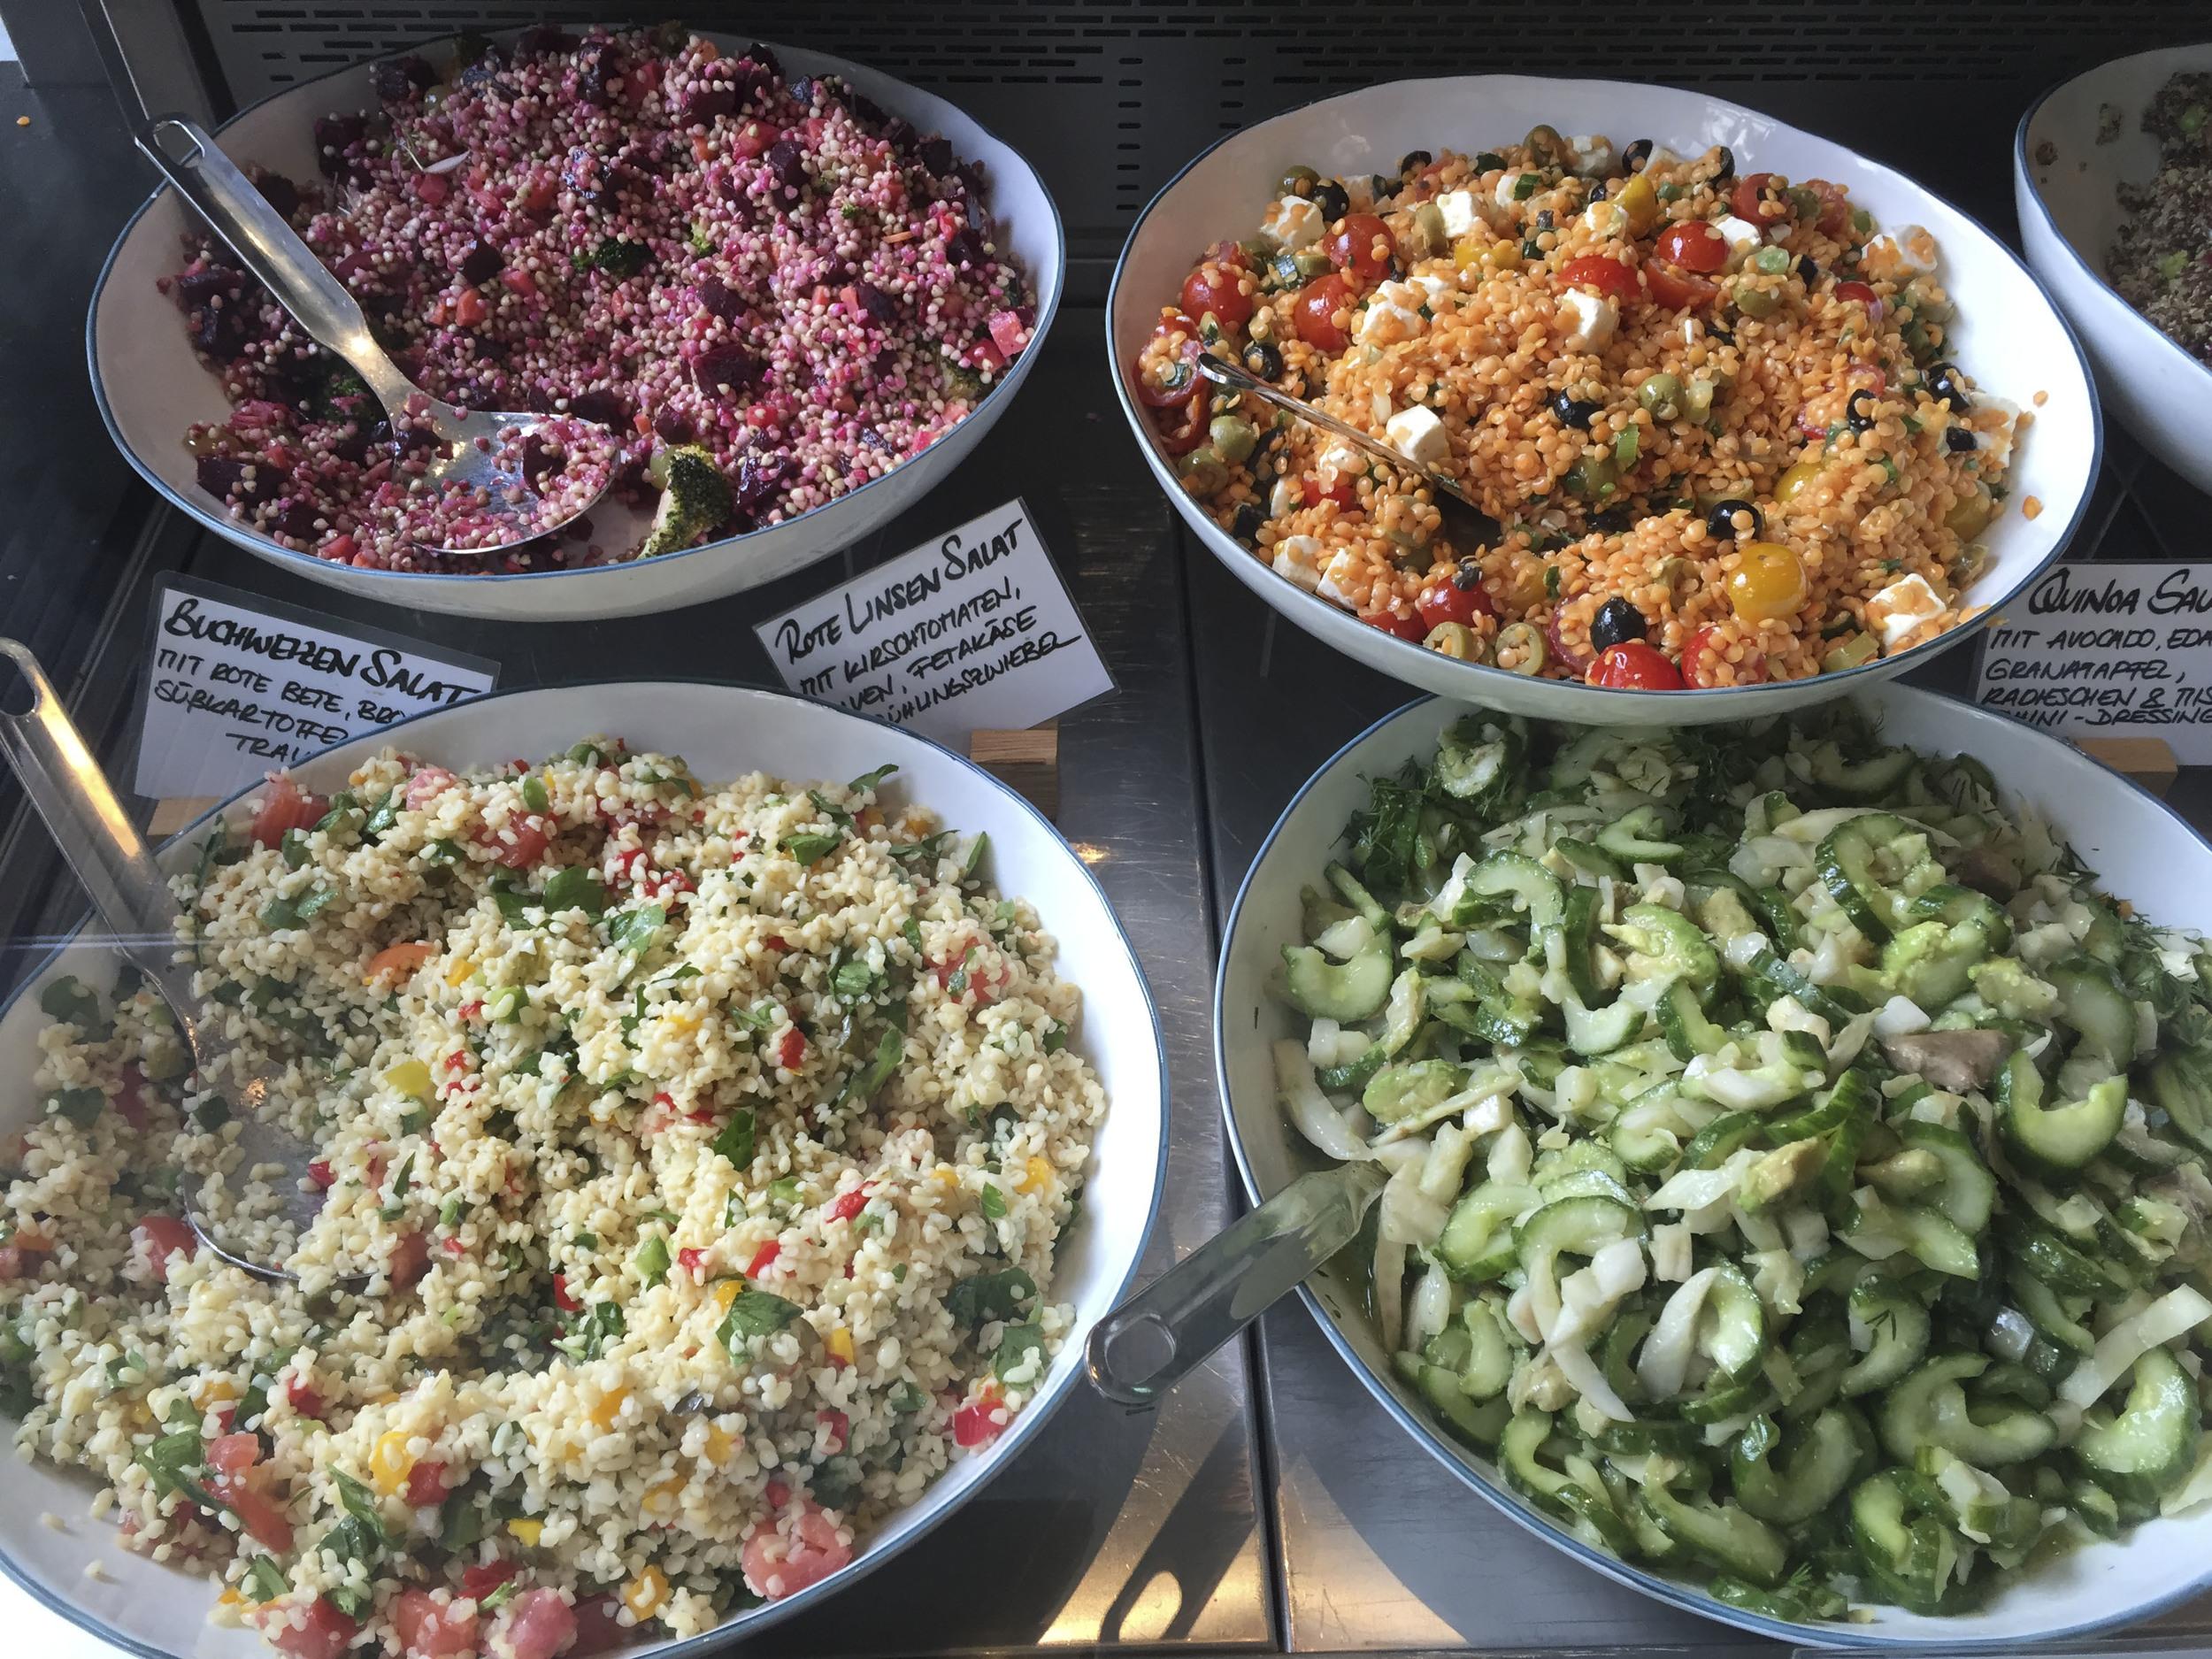 Laura's Deli, Healthy food Restaurant  Düsseldorf4219.jpg